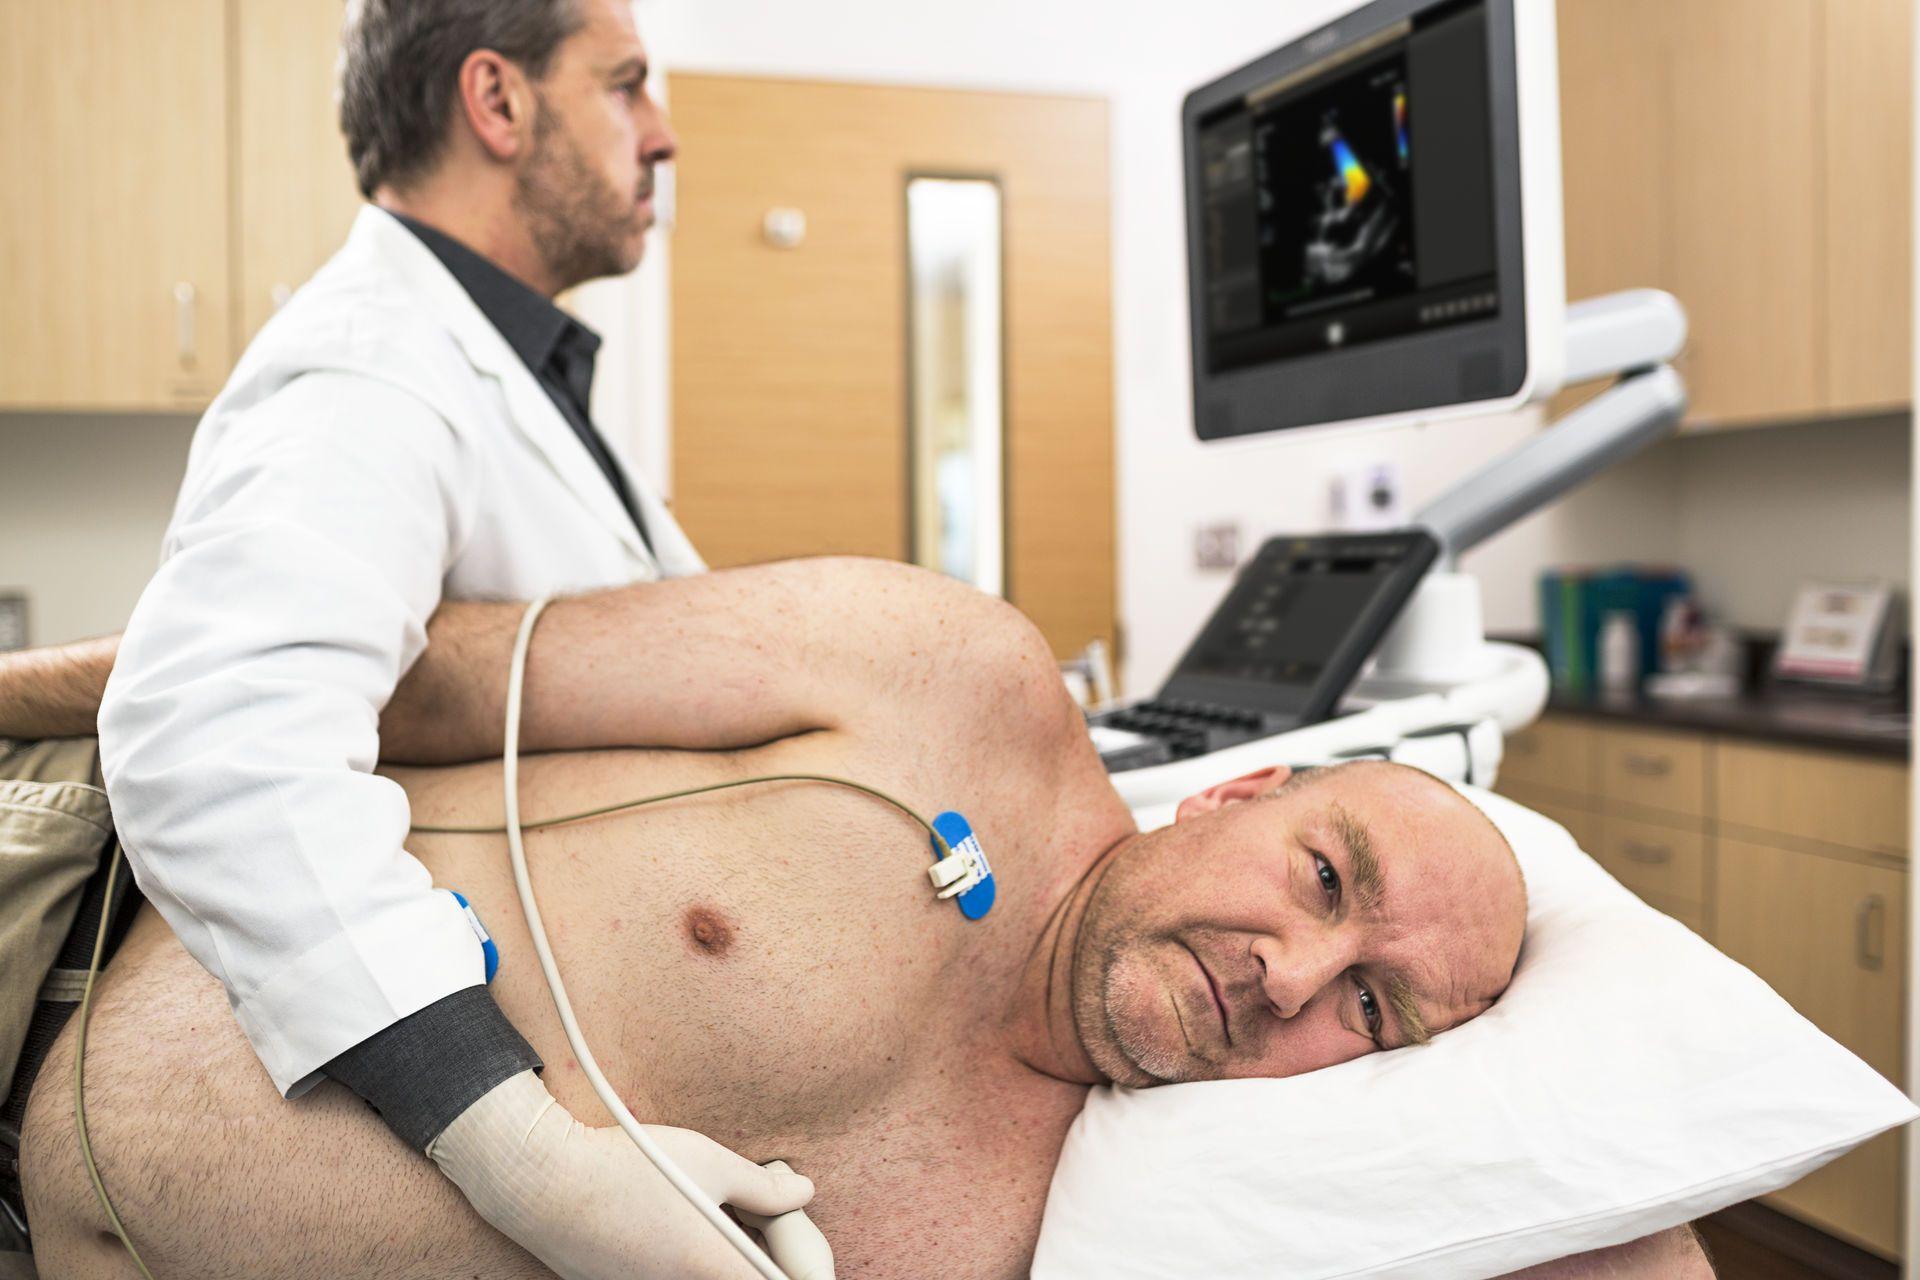 Kardiologia Philips Affiniti 70 CV Ultrasound 1305